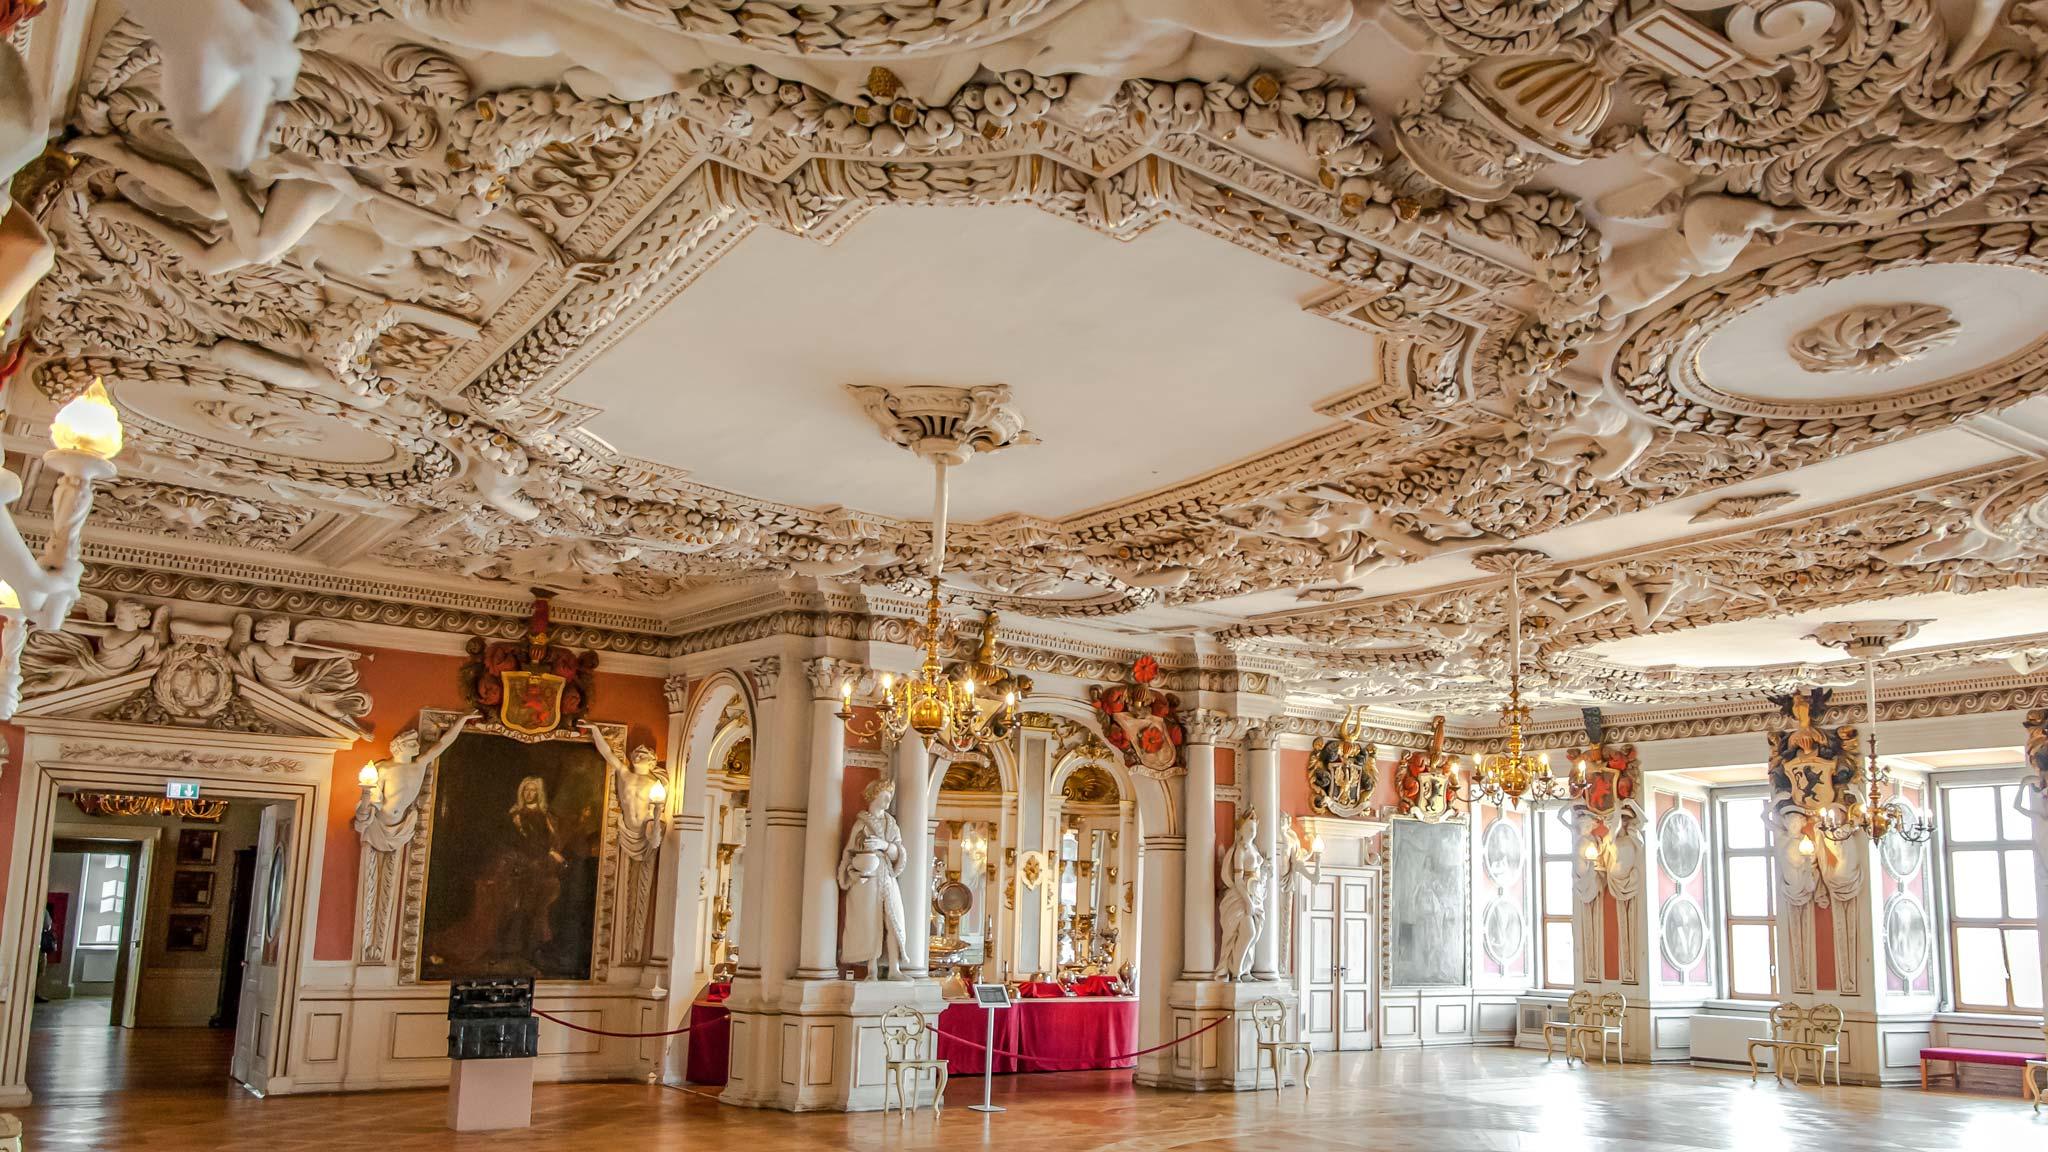 Palace inside Gotha Thuringia